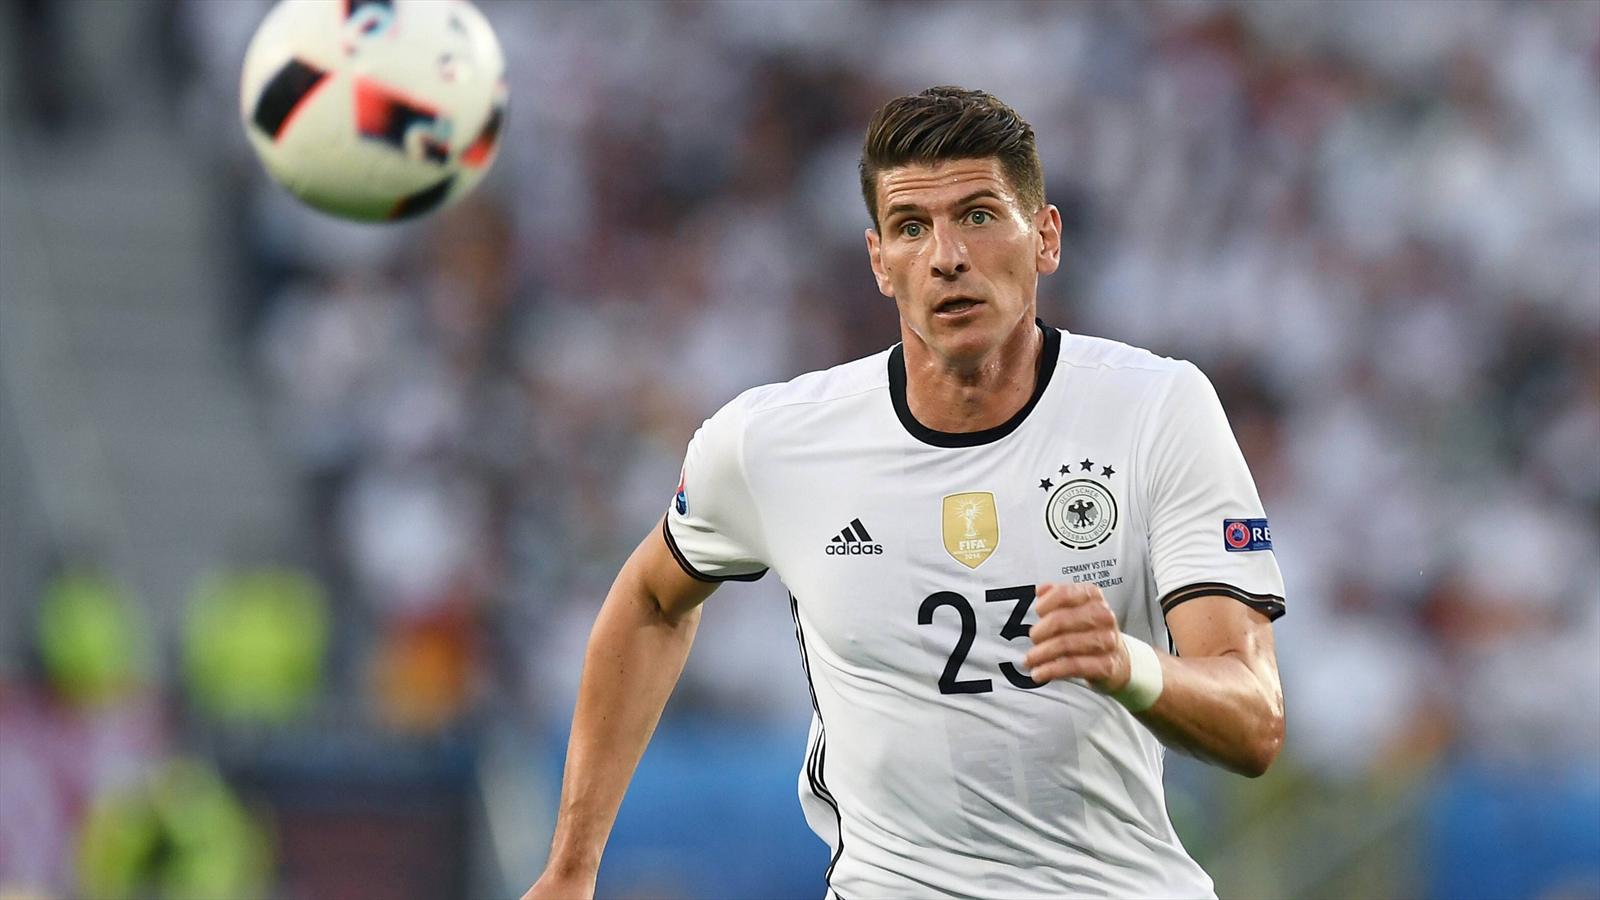 Germany striker Mario Gomez signs for Wolfsburg - Football - Eurosport